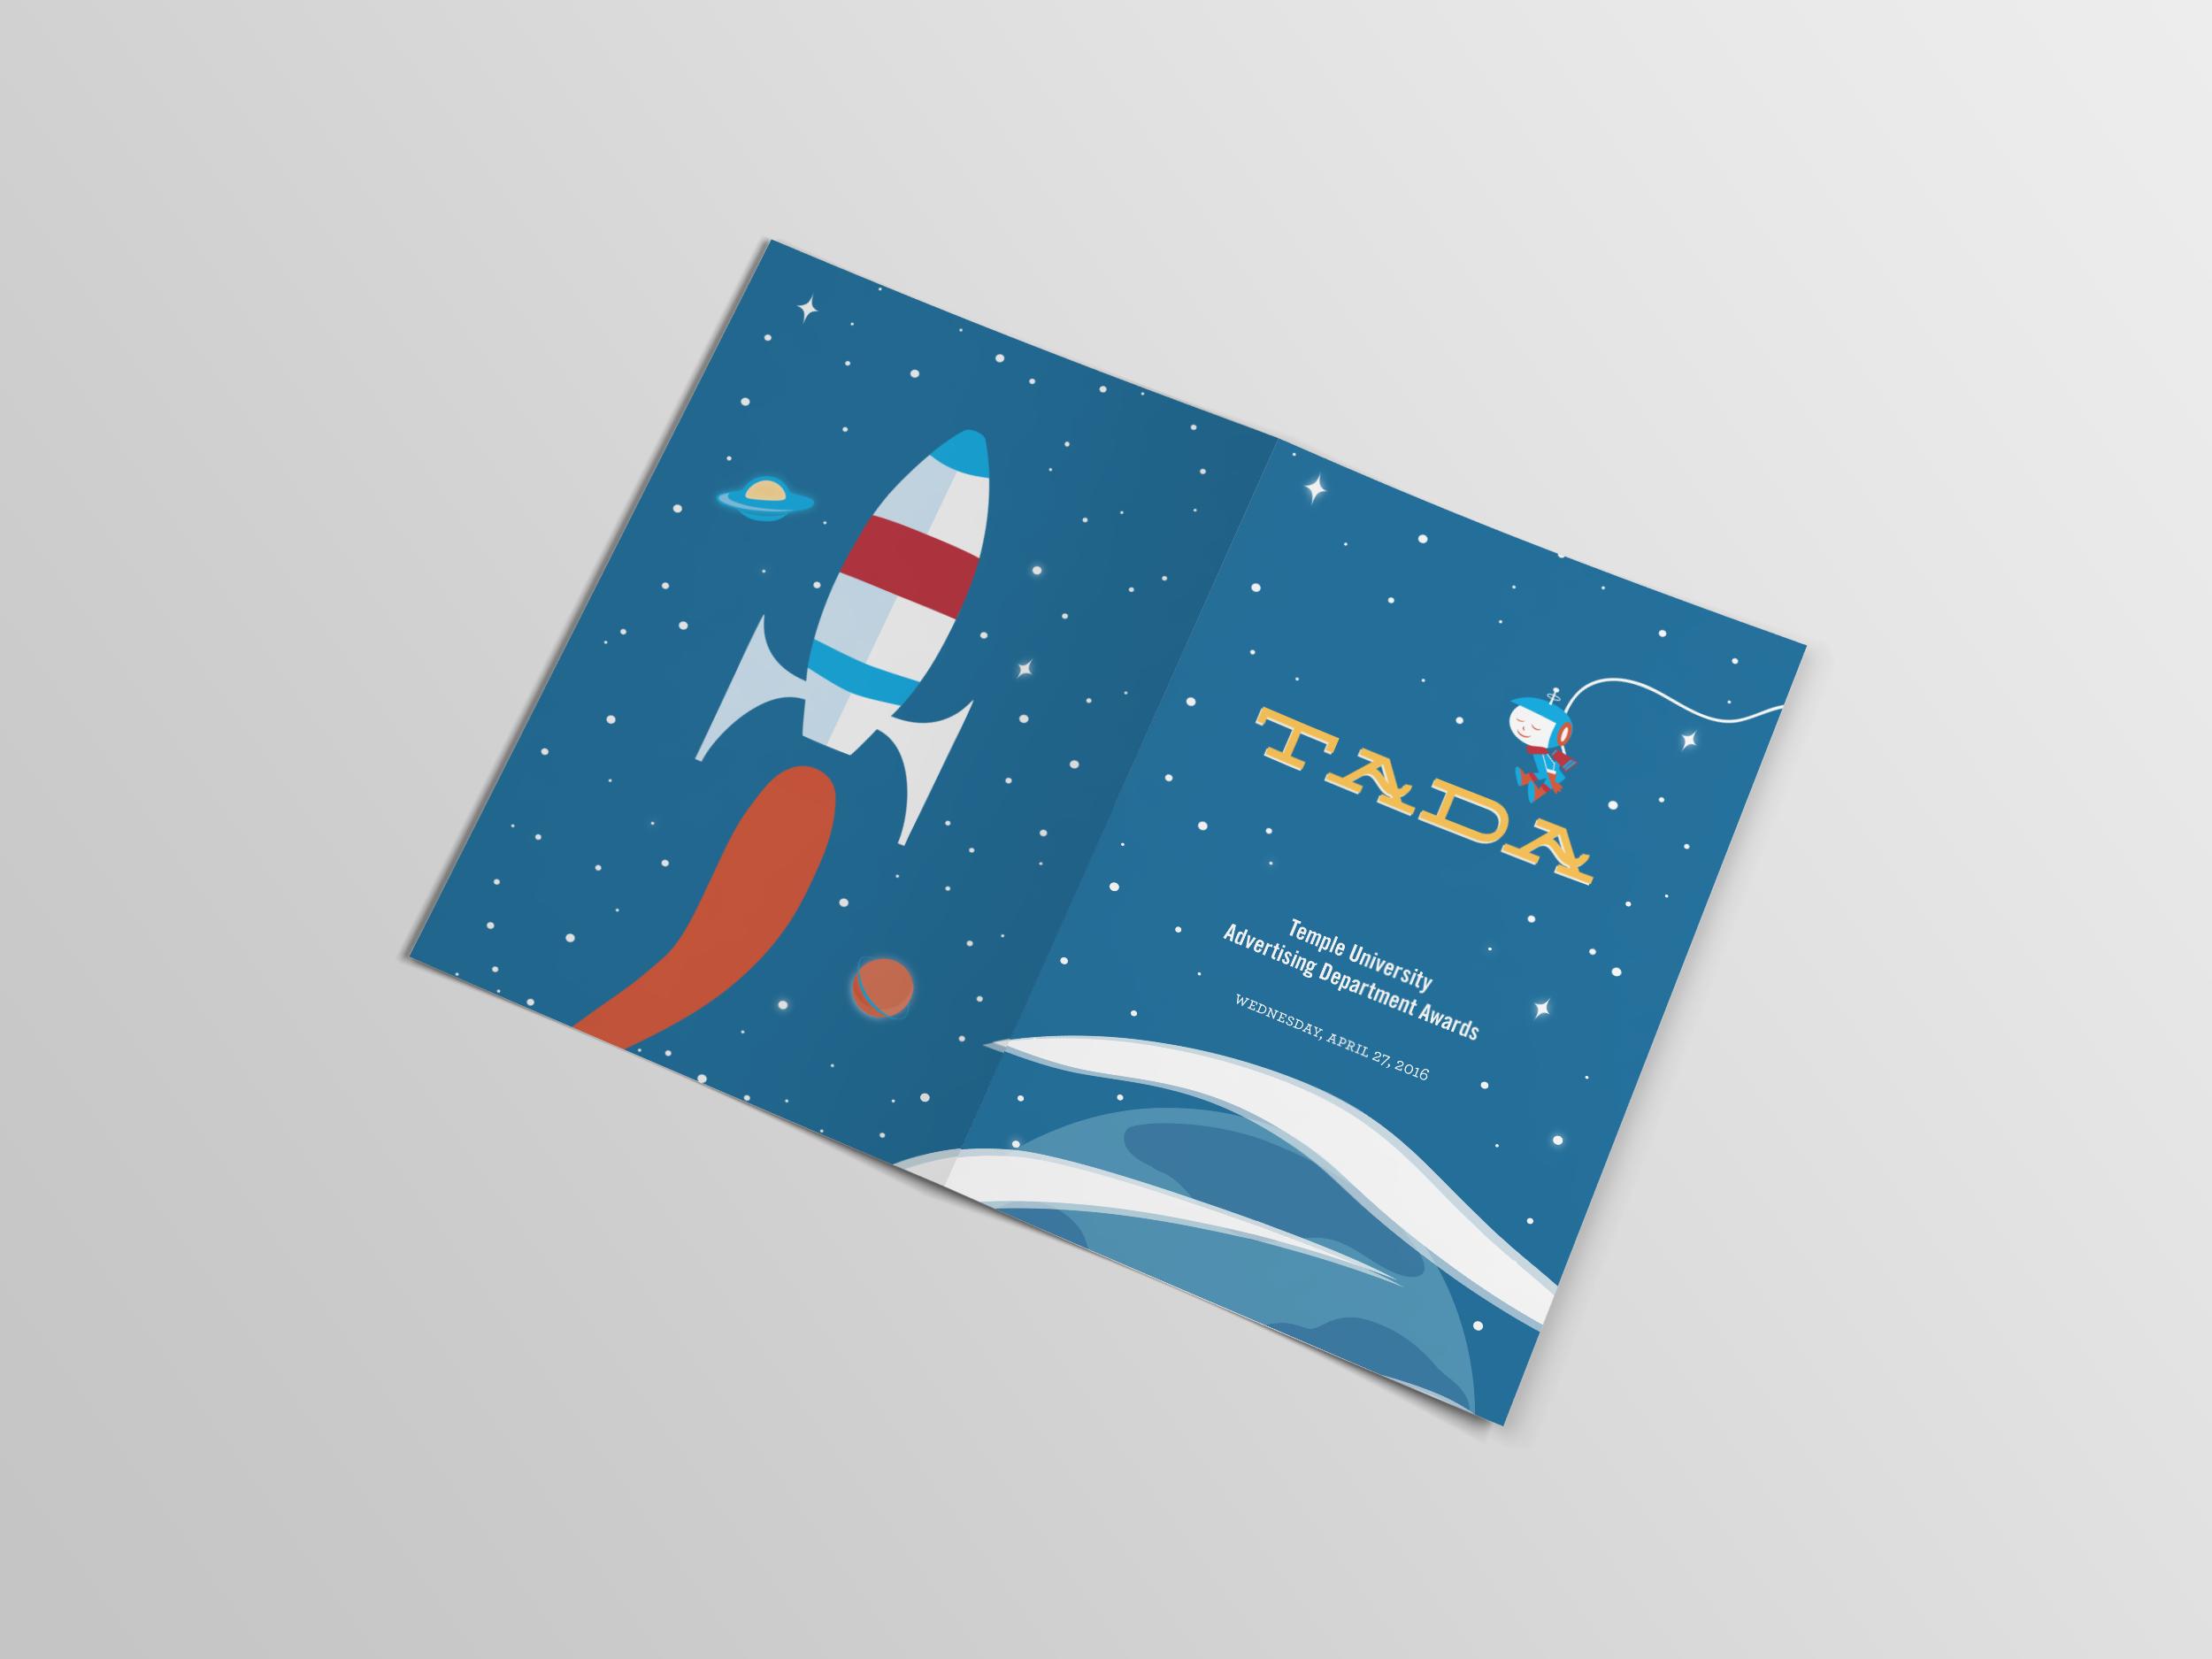 TADA_Booklet_Full.png